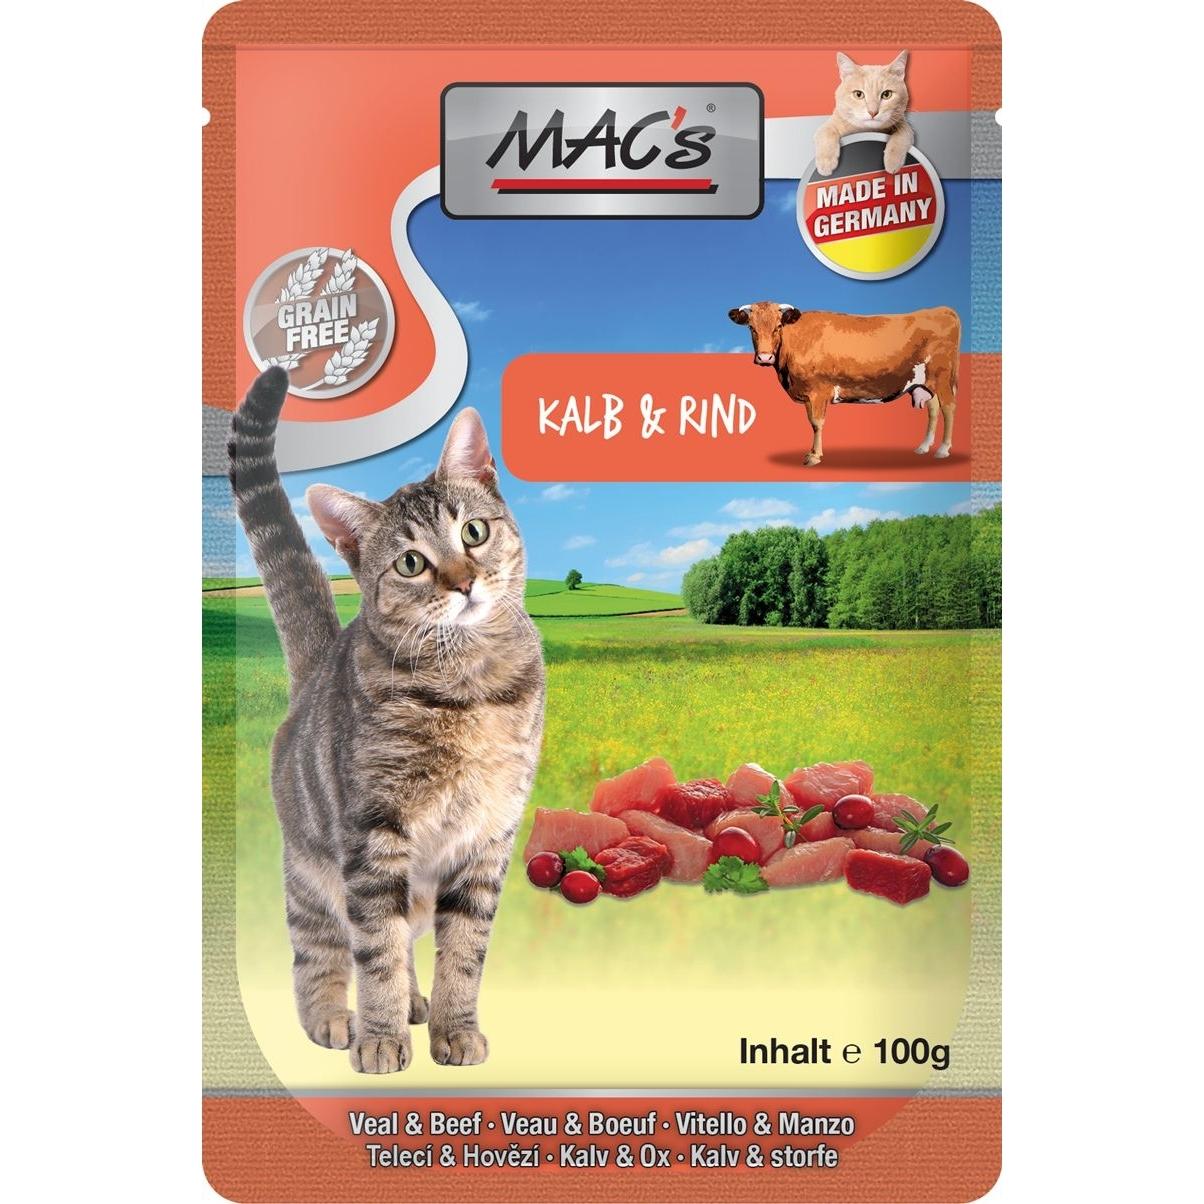 MACs Cat Pouch Pack Frischebeutel, Bild 2